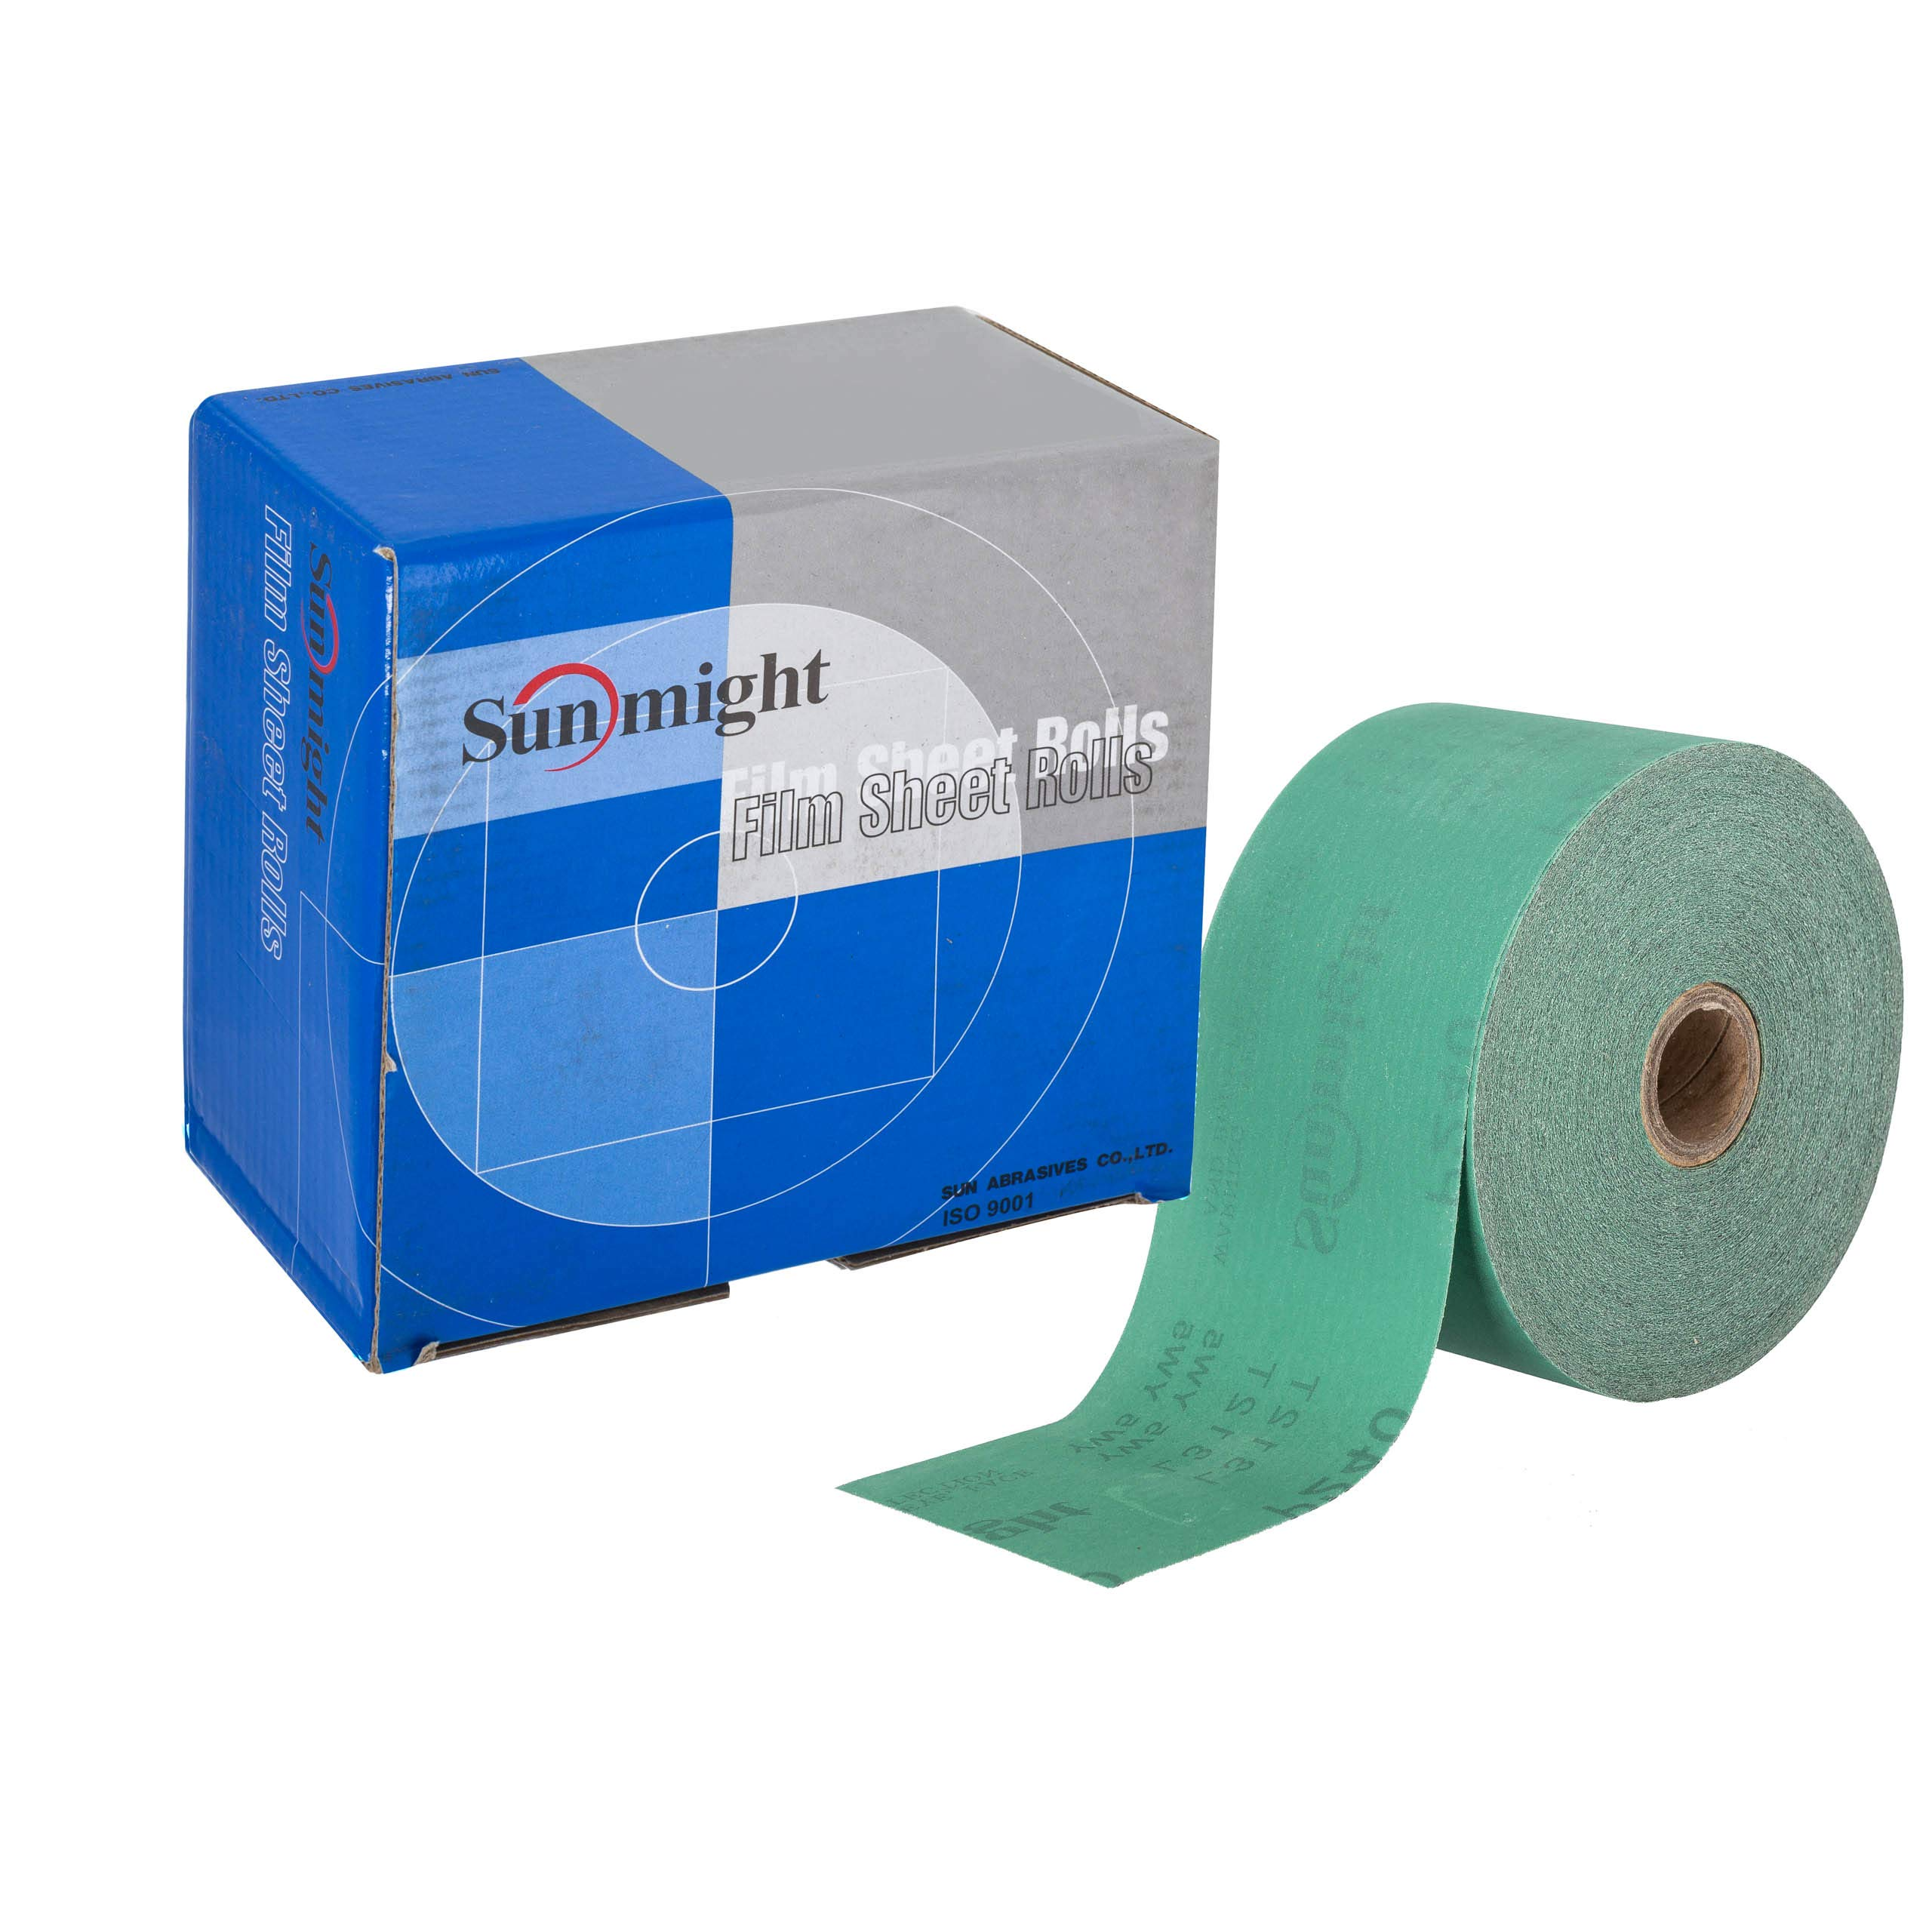 Sunmight 22114 1 Pack 2-3/4'' X 45 yd PSA Sheet Roll (Film Grit 320)